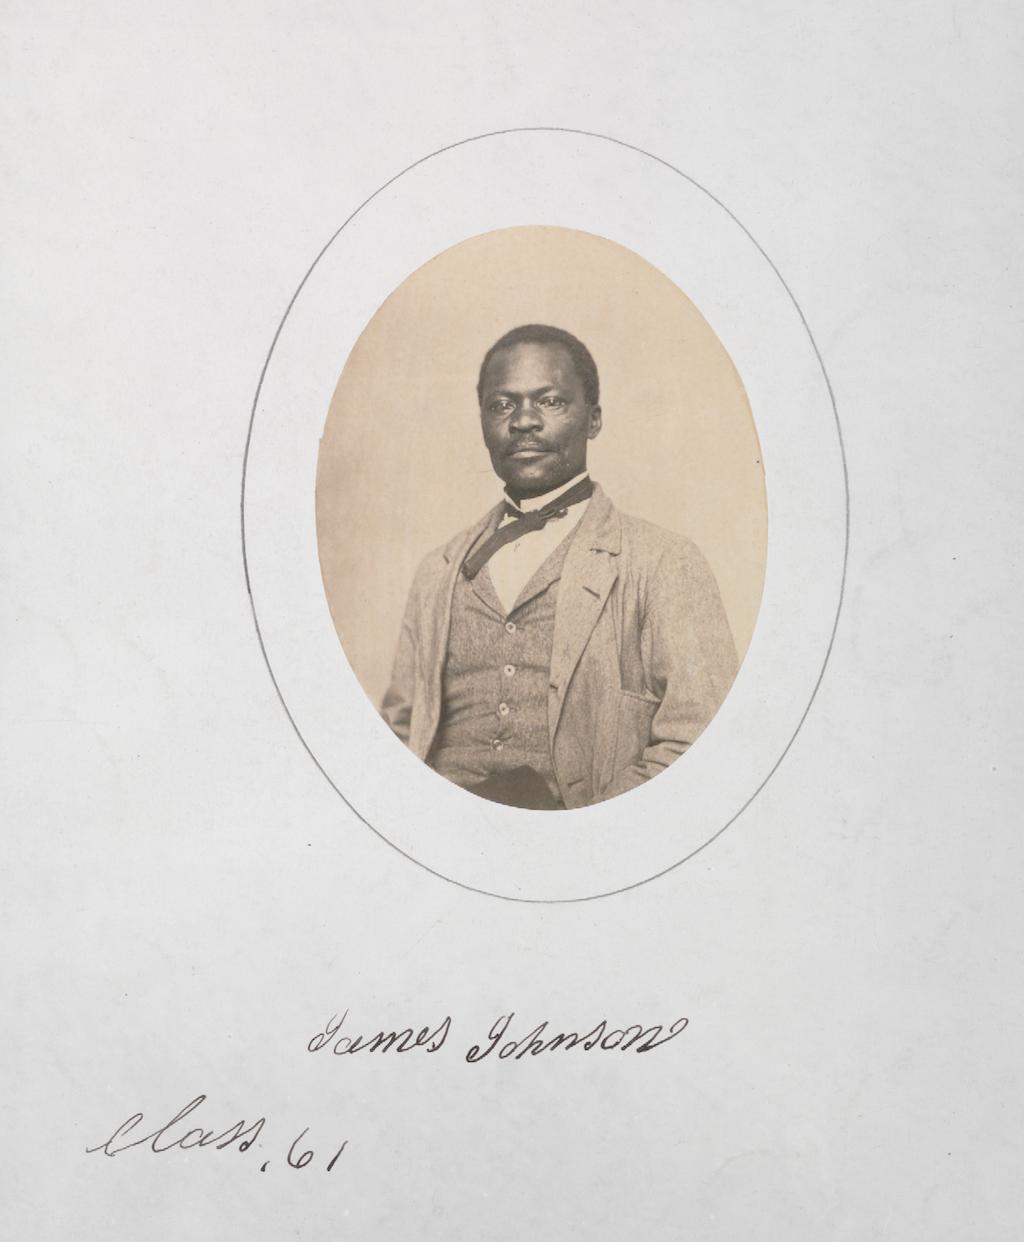 Johnson 1861